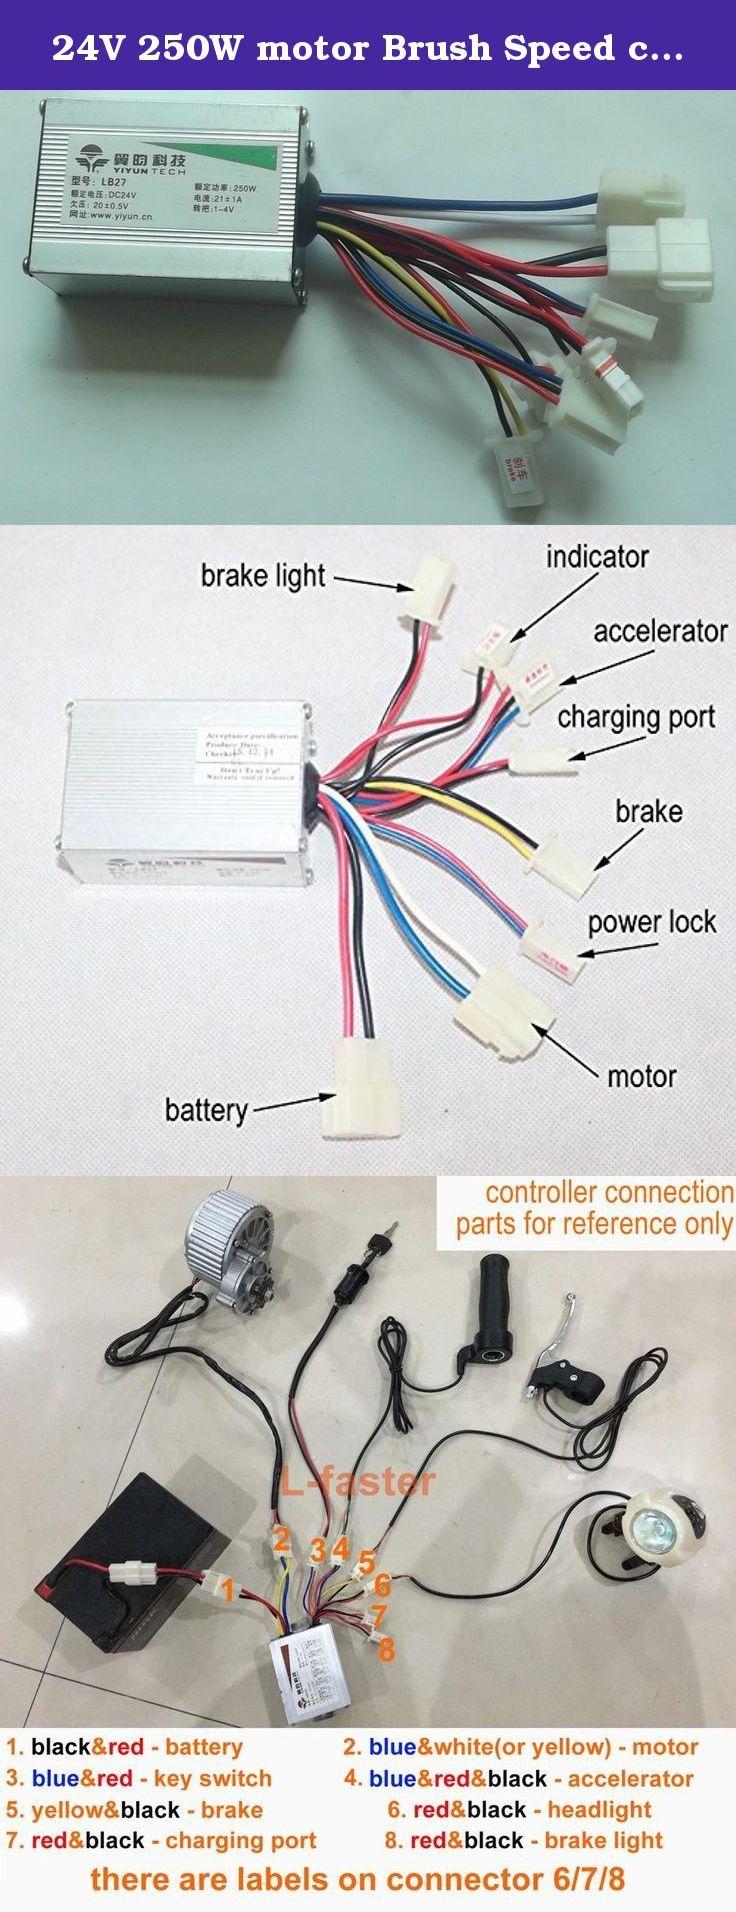 24V 250W motor Brush Speed controller for Electric bike